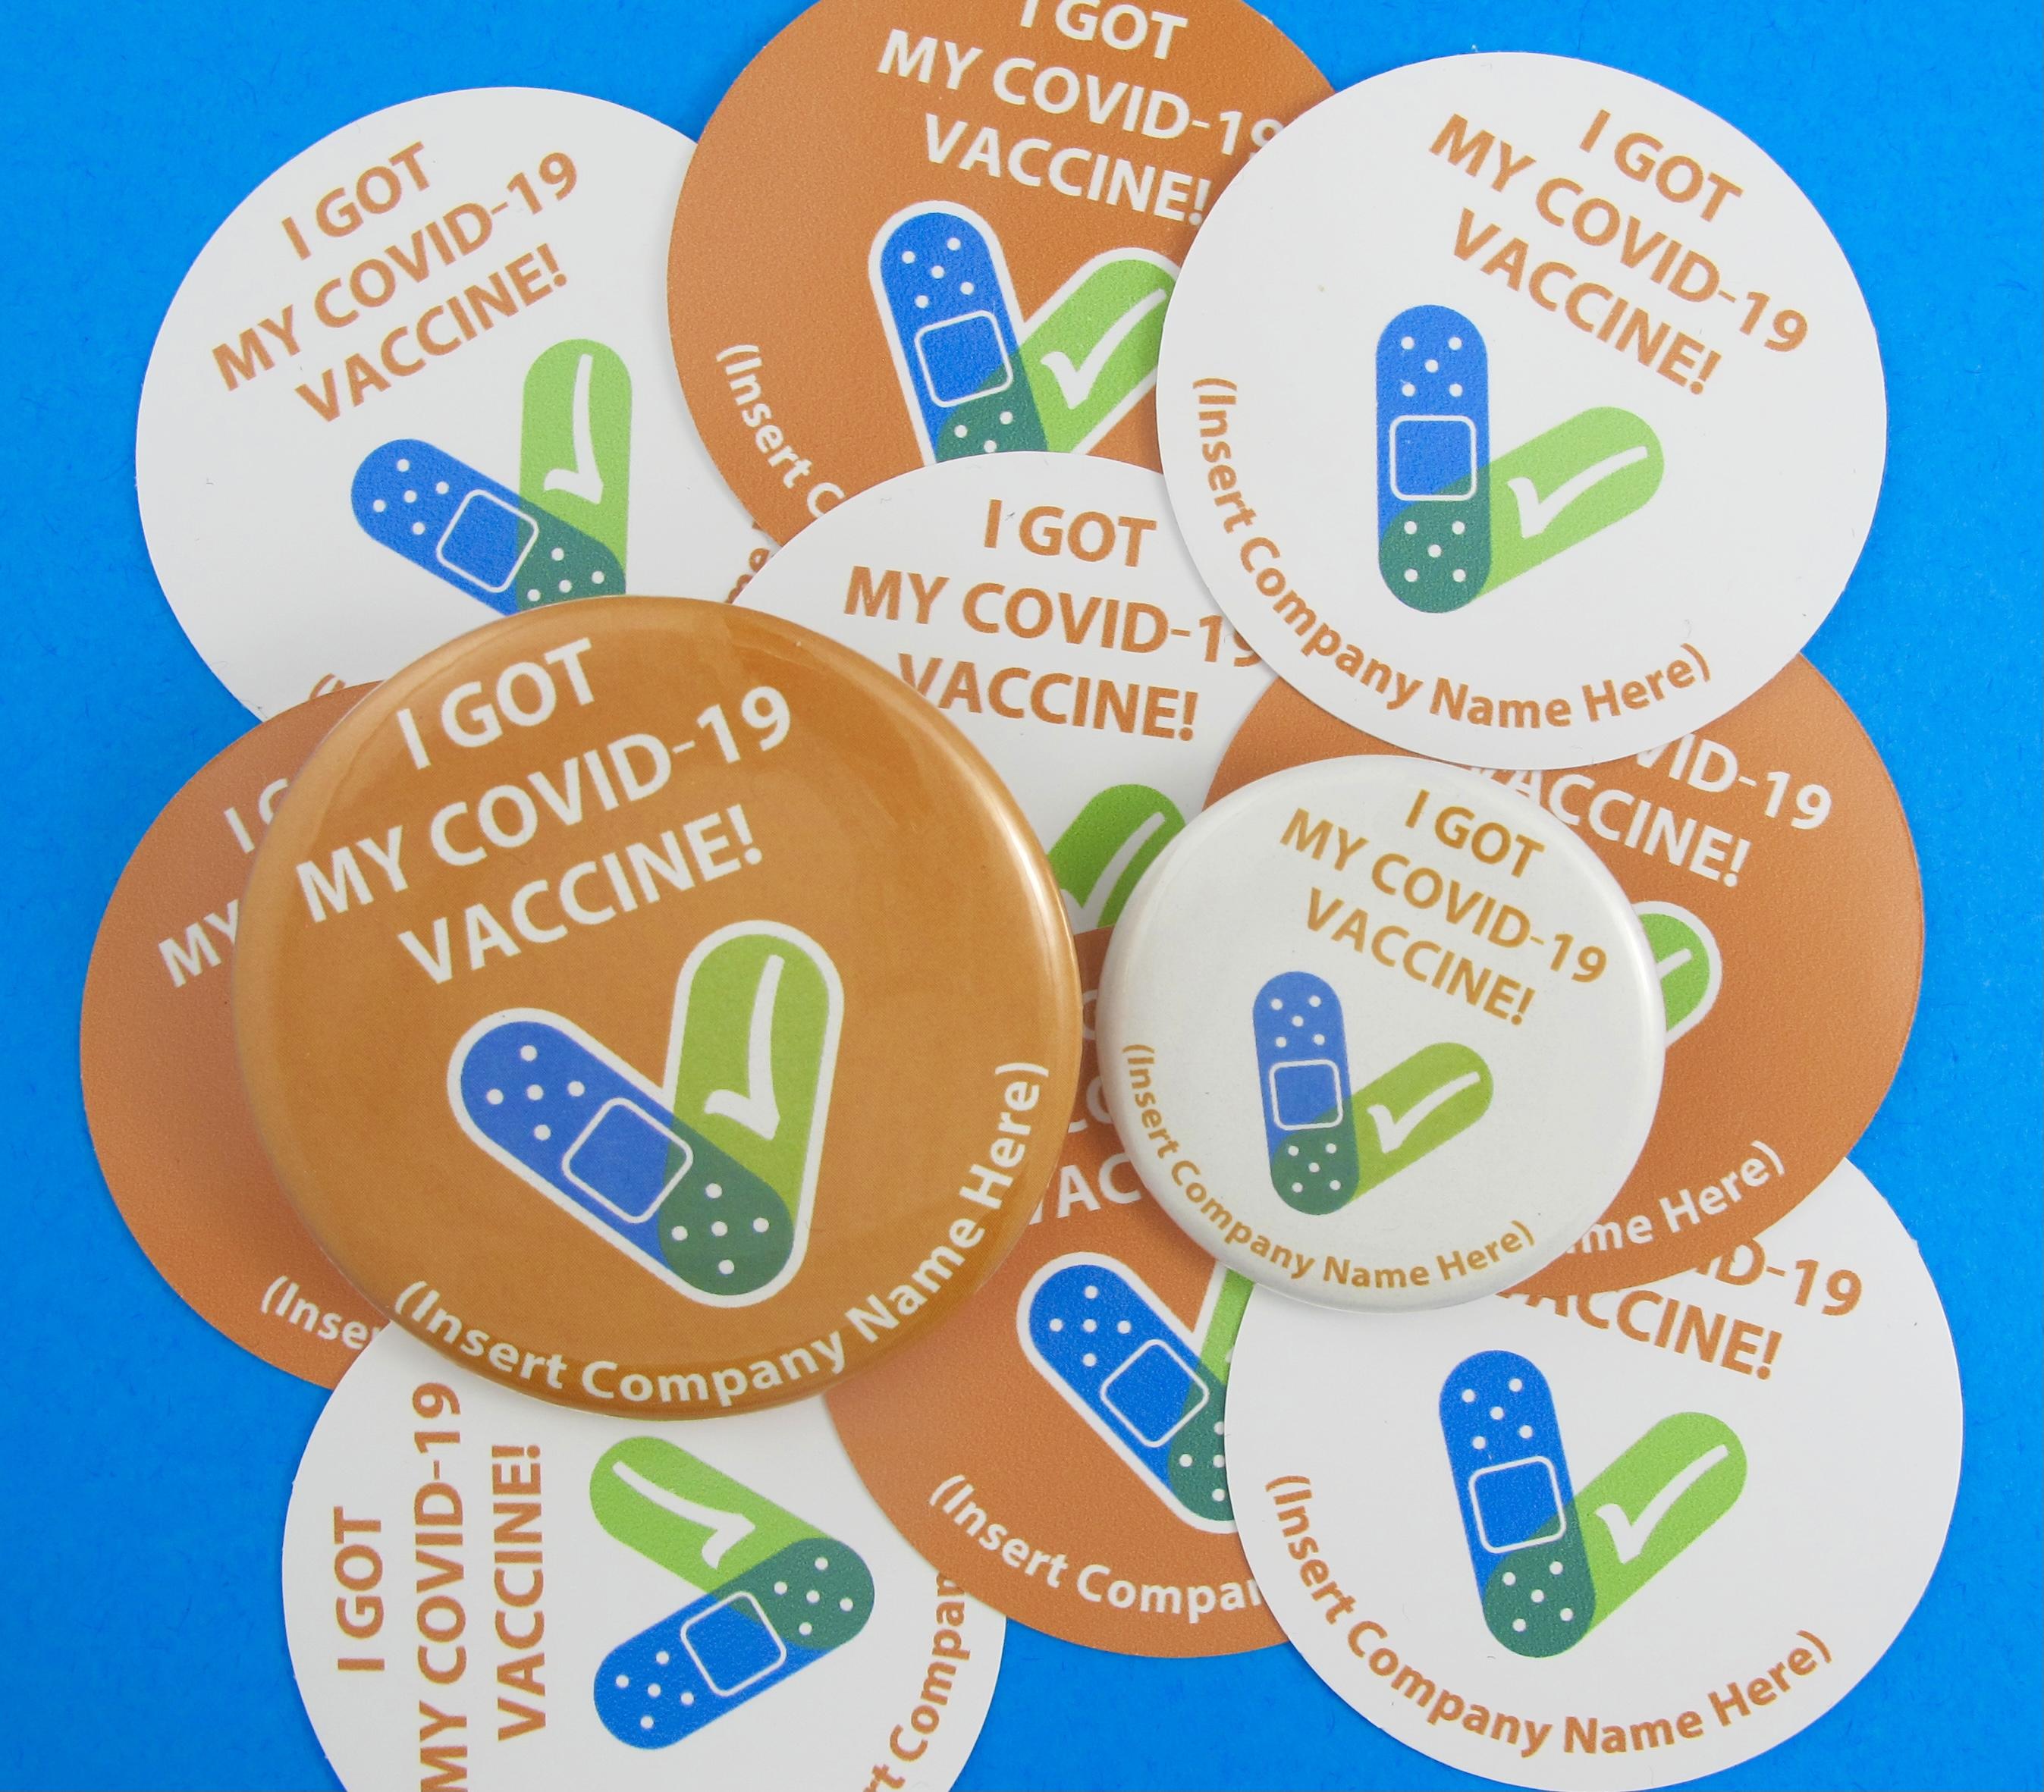 CDC Vaccine Designs